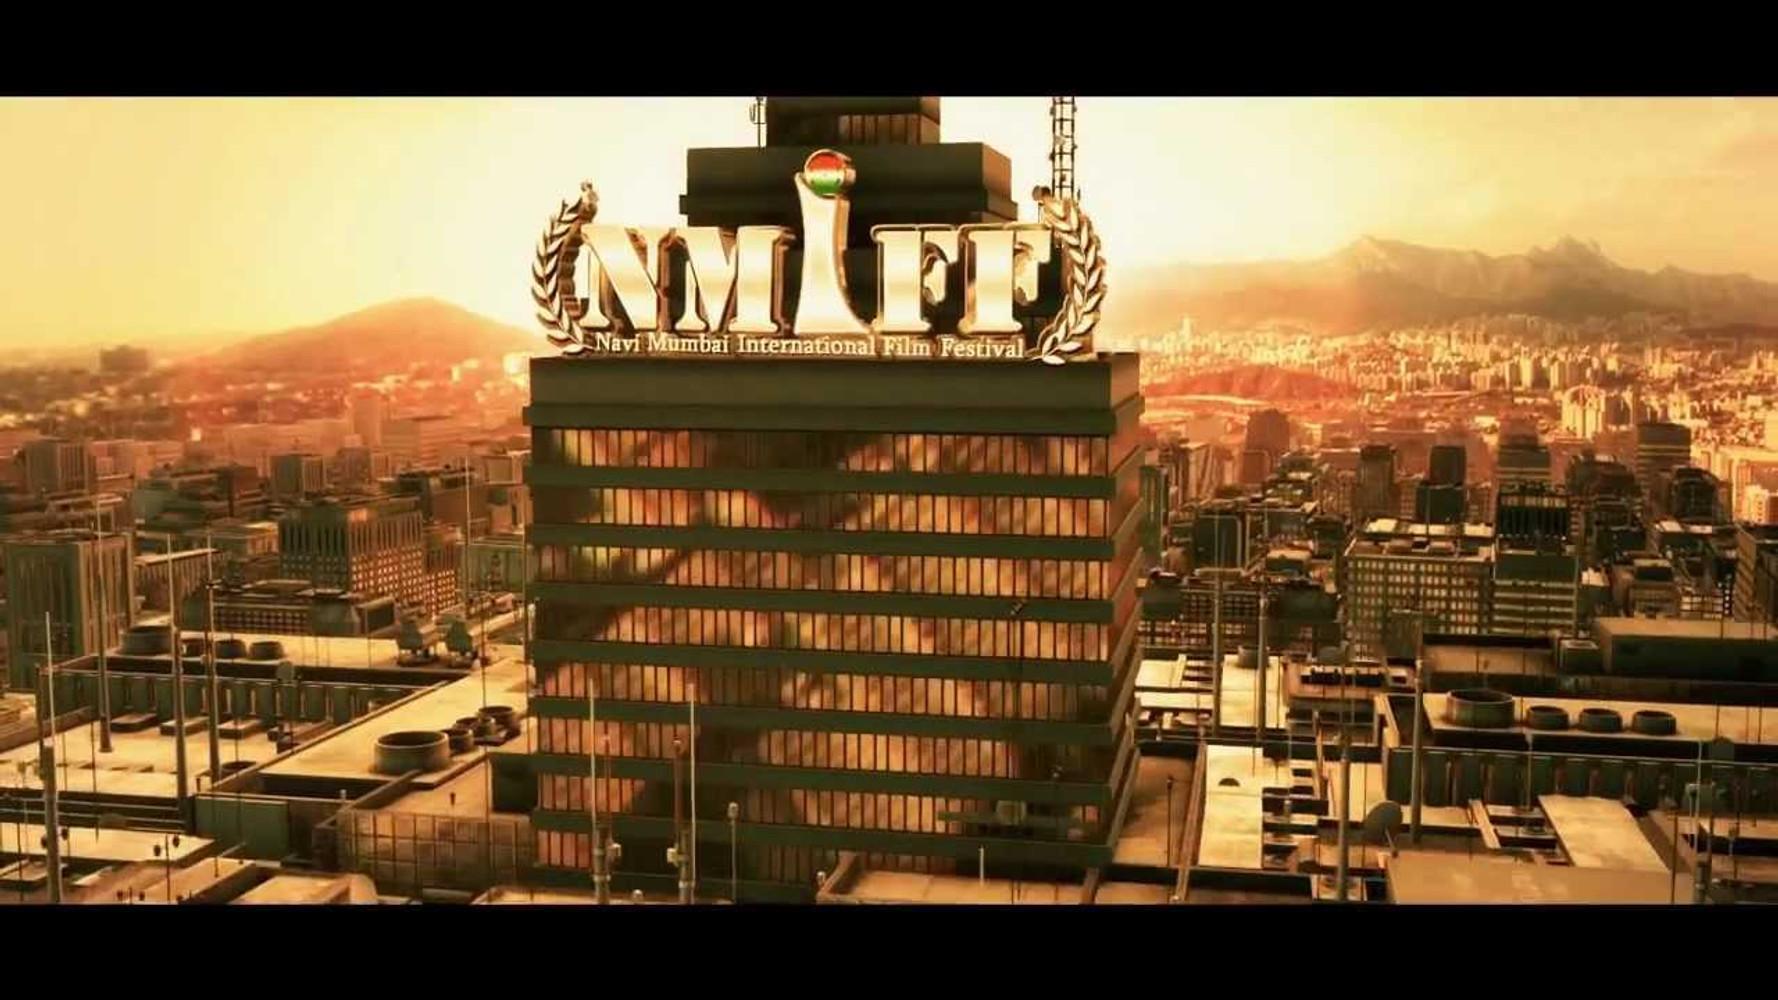 NMIFF - Banjara Cinema